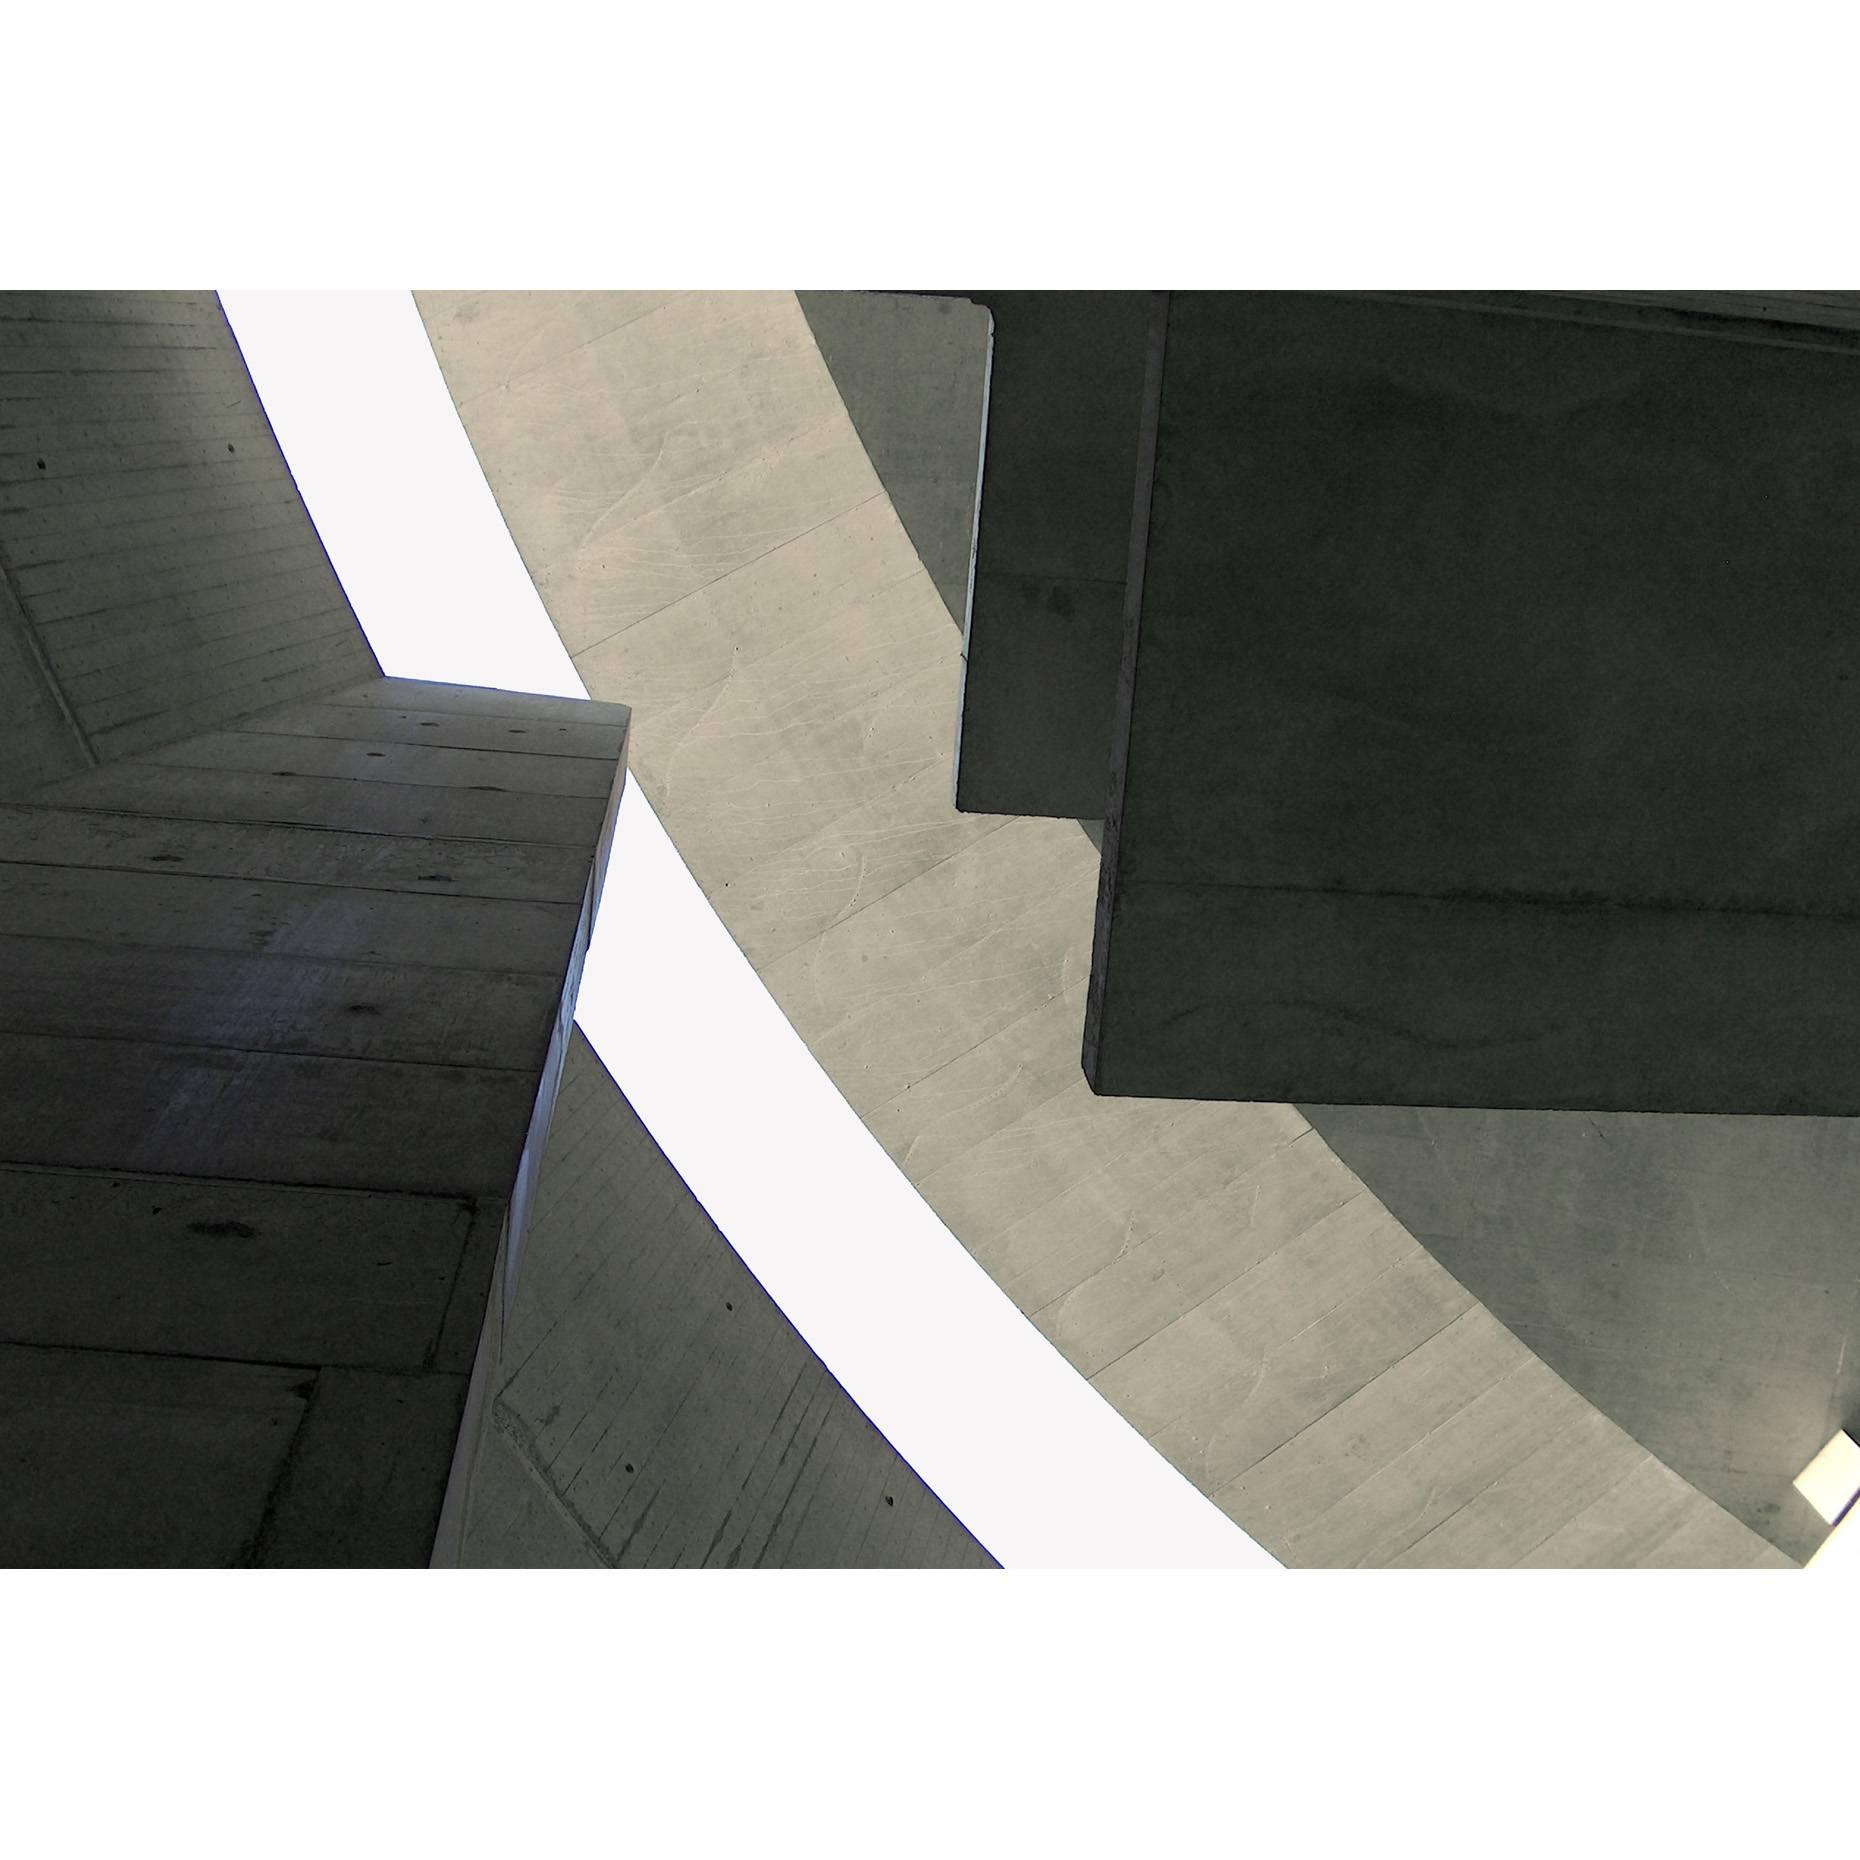 Haus für Musiker 2010 Ultrachrome K3 Tinte a/Canson Infinity 210g/qm Din A3 Aufl. III